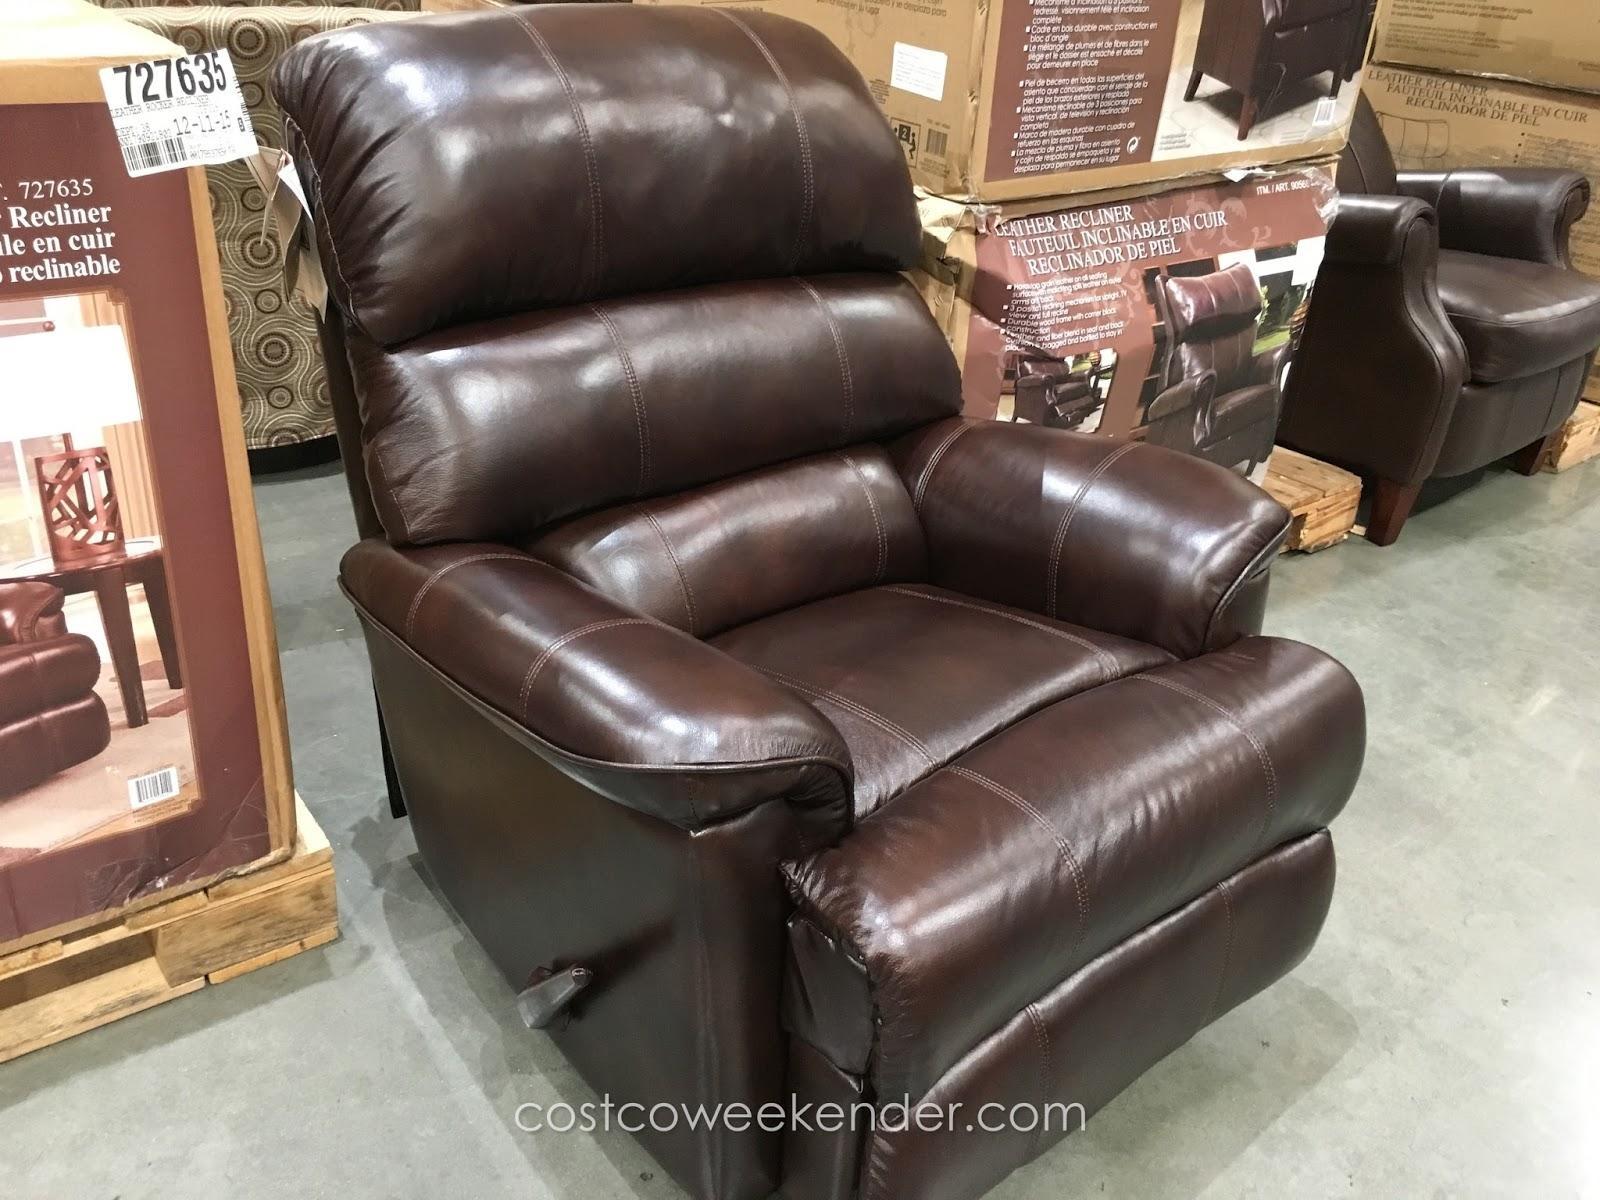 Sofas Center : Berkline Leather Reclininga Costco Weekender Pertaining To Berkline Leather Recliner Sofas (Image 11 of 20)